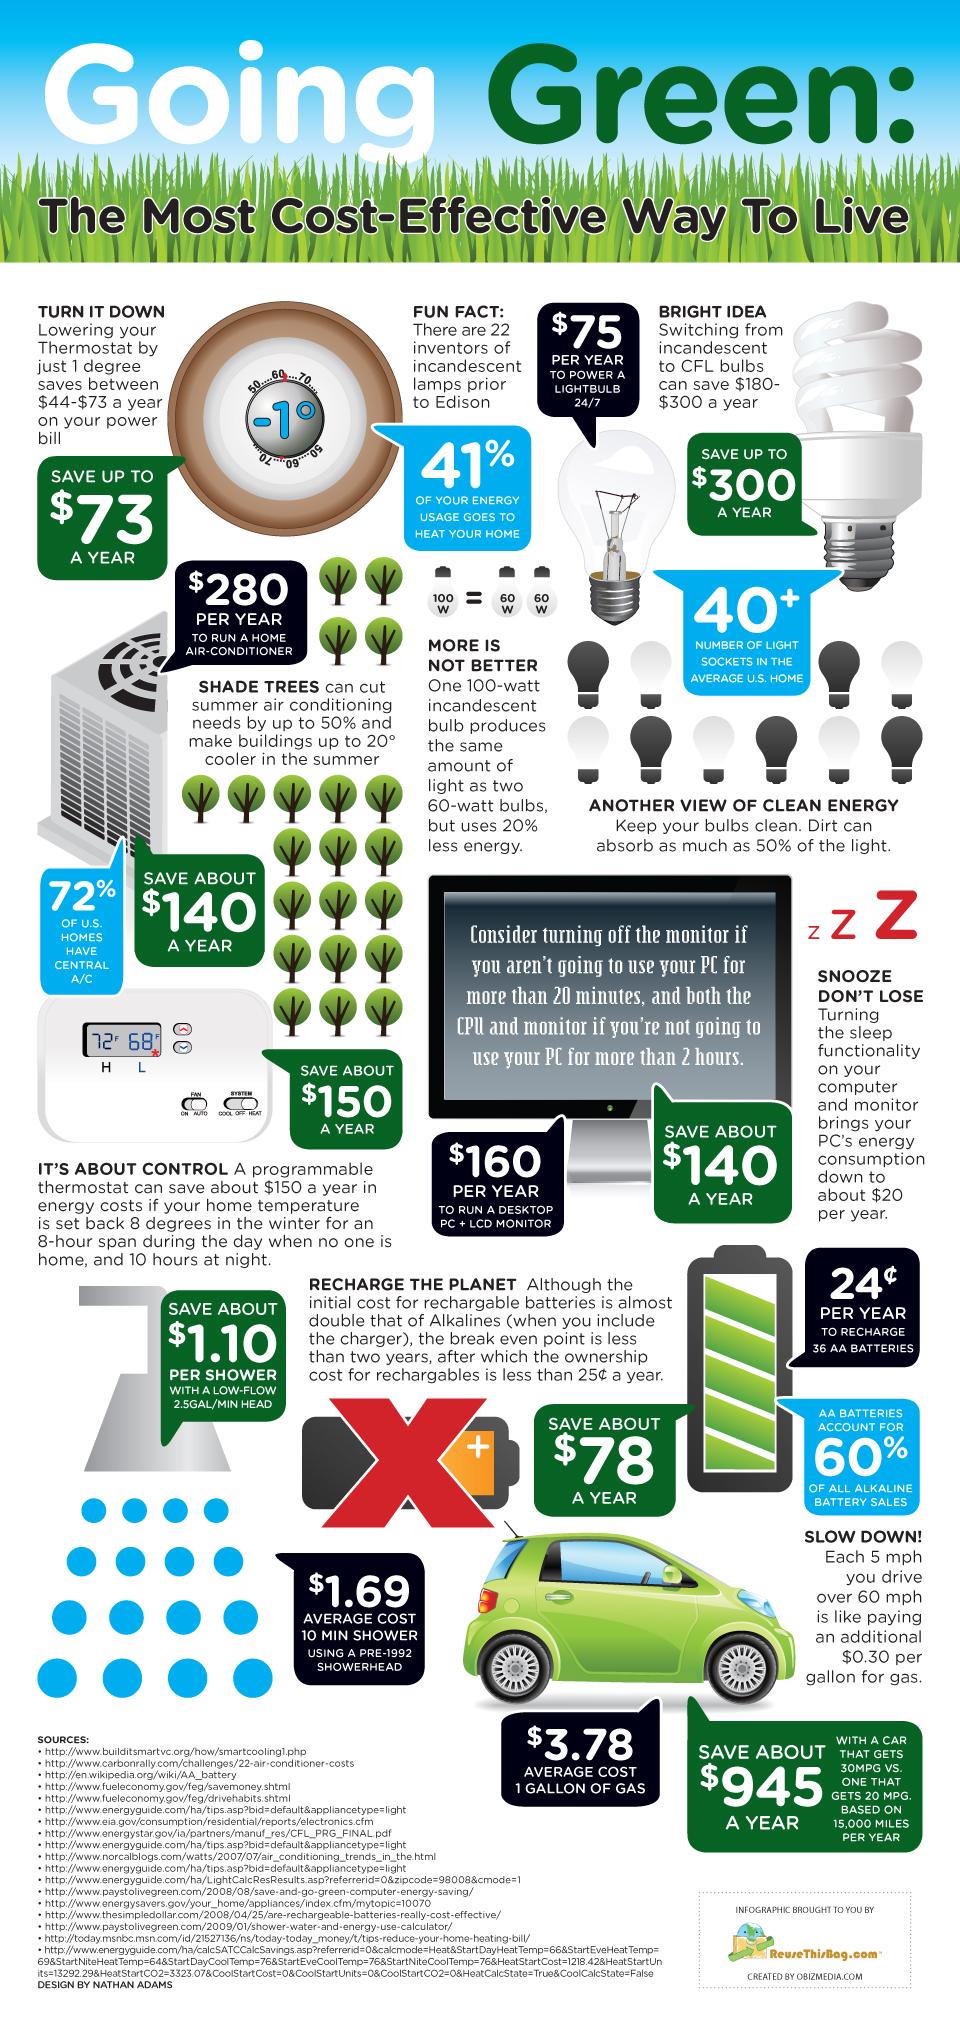 goinggreen_infographic_960.jpg